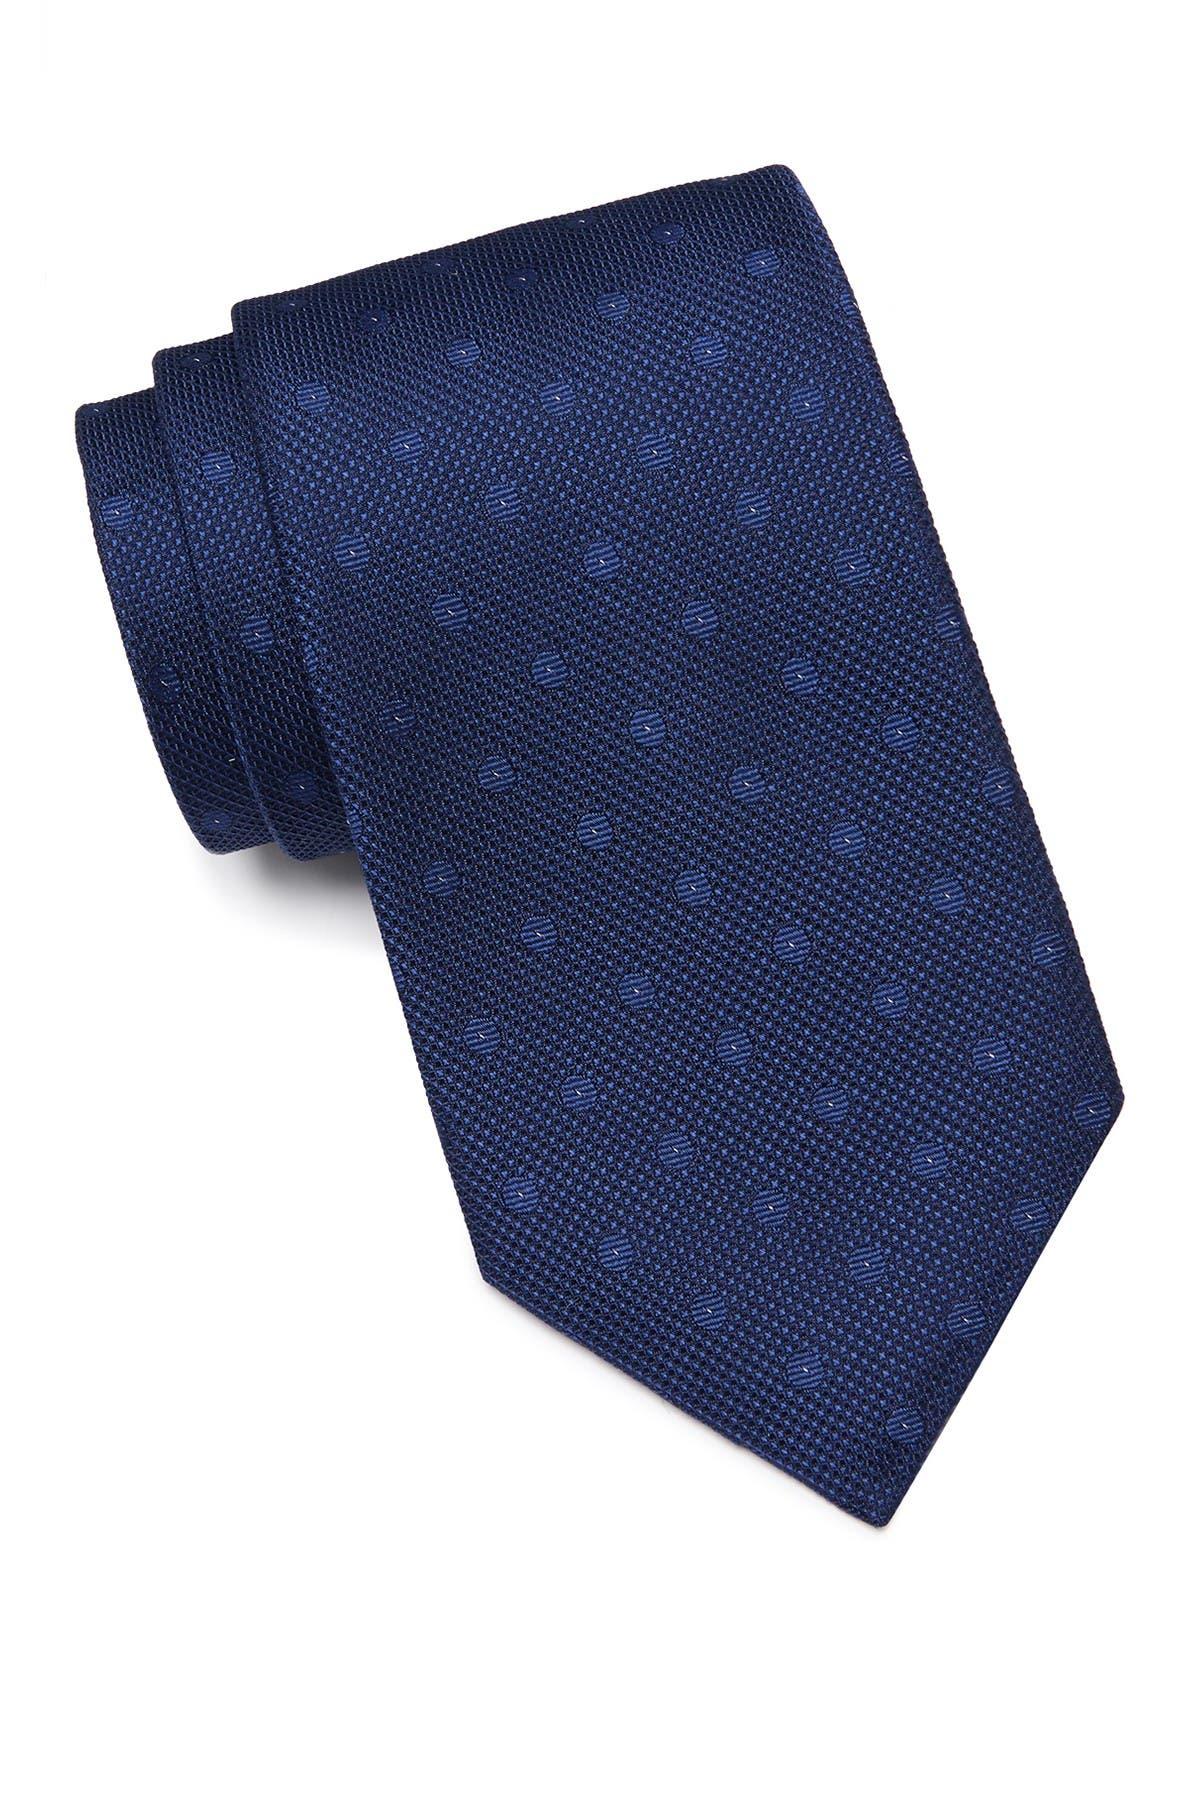 Image of Calvin Klein Small Double Dot Silk Tie